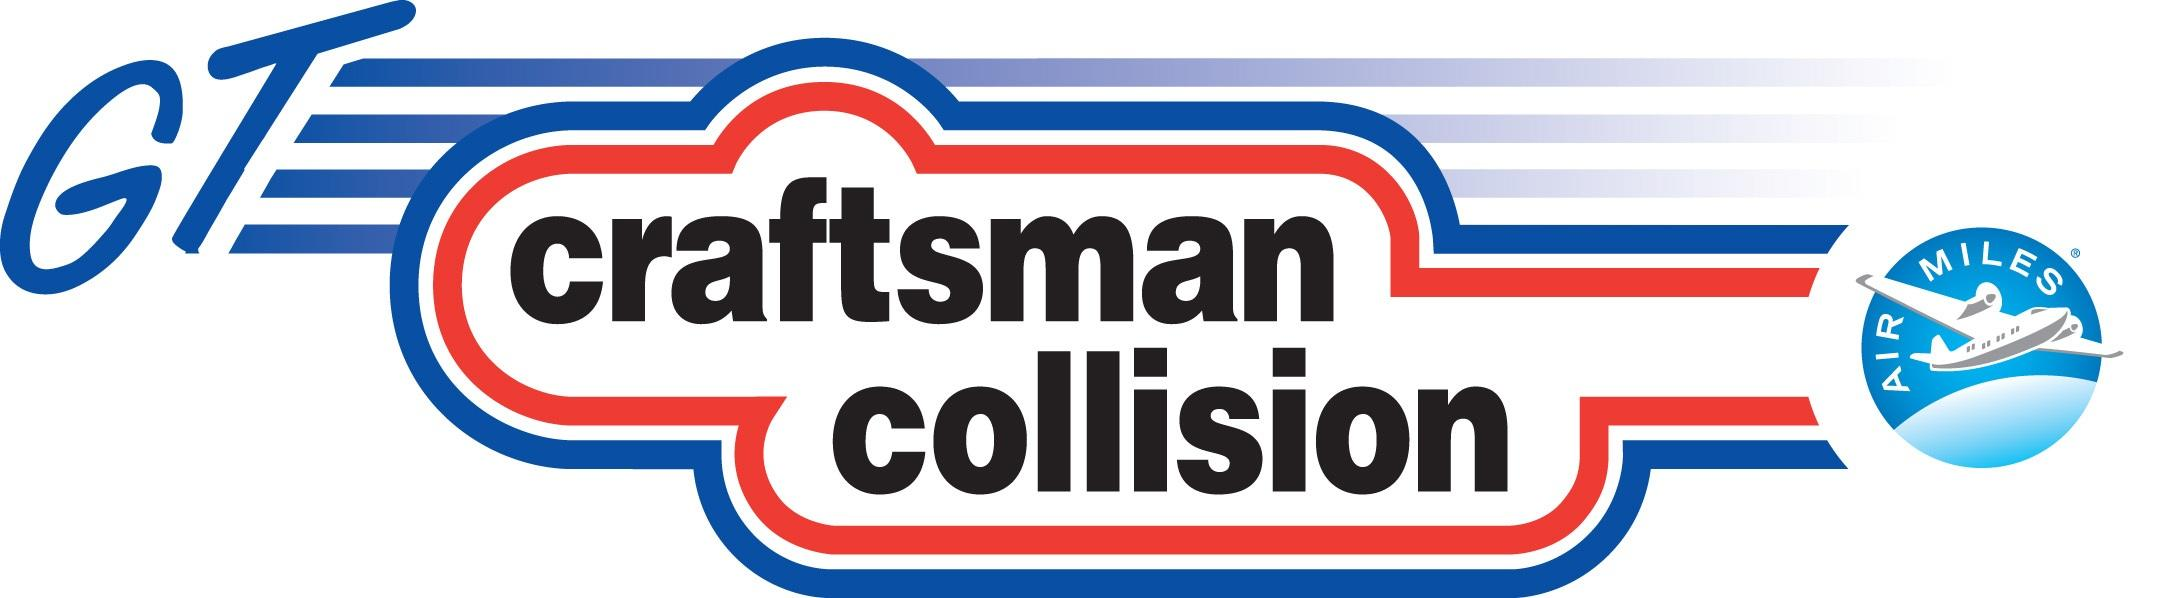 GTCraftsman Collision Logo